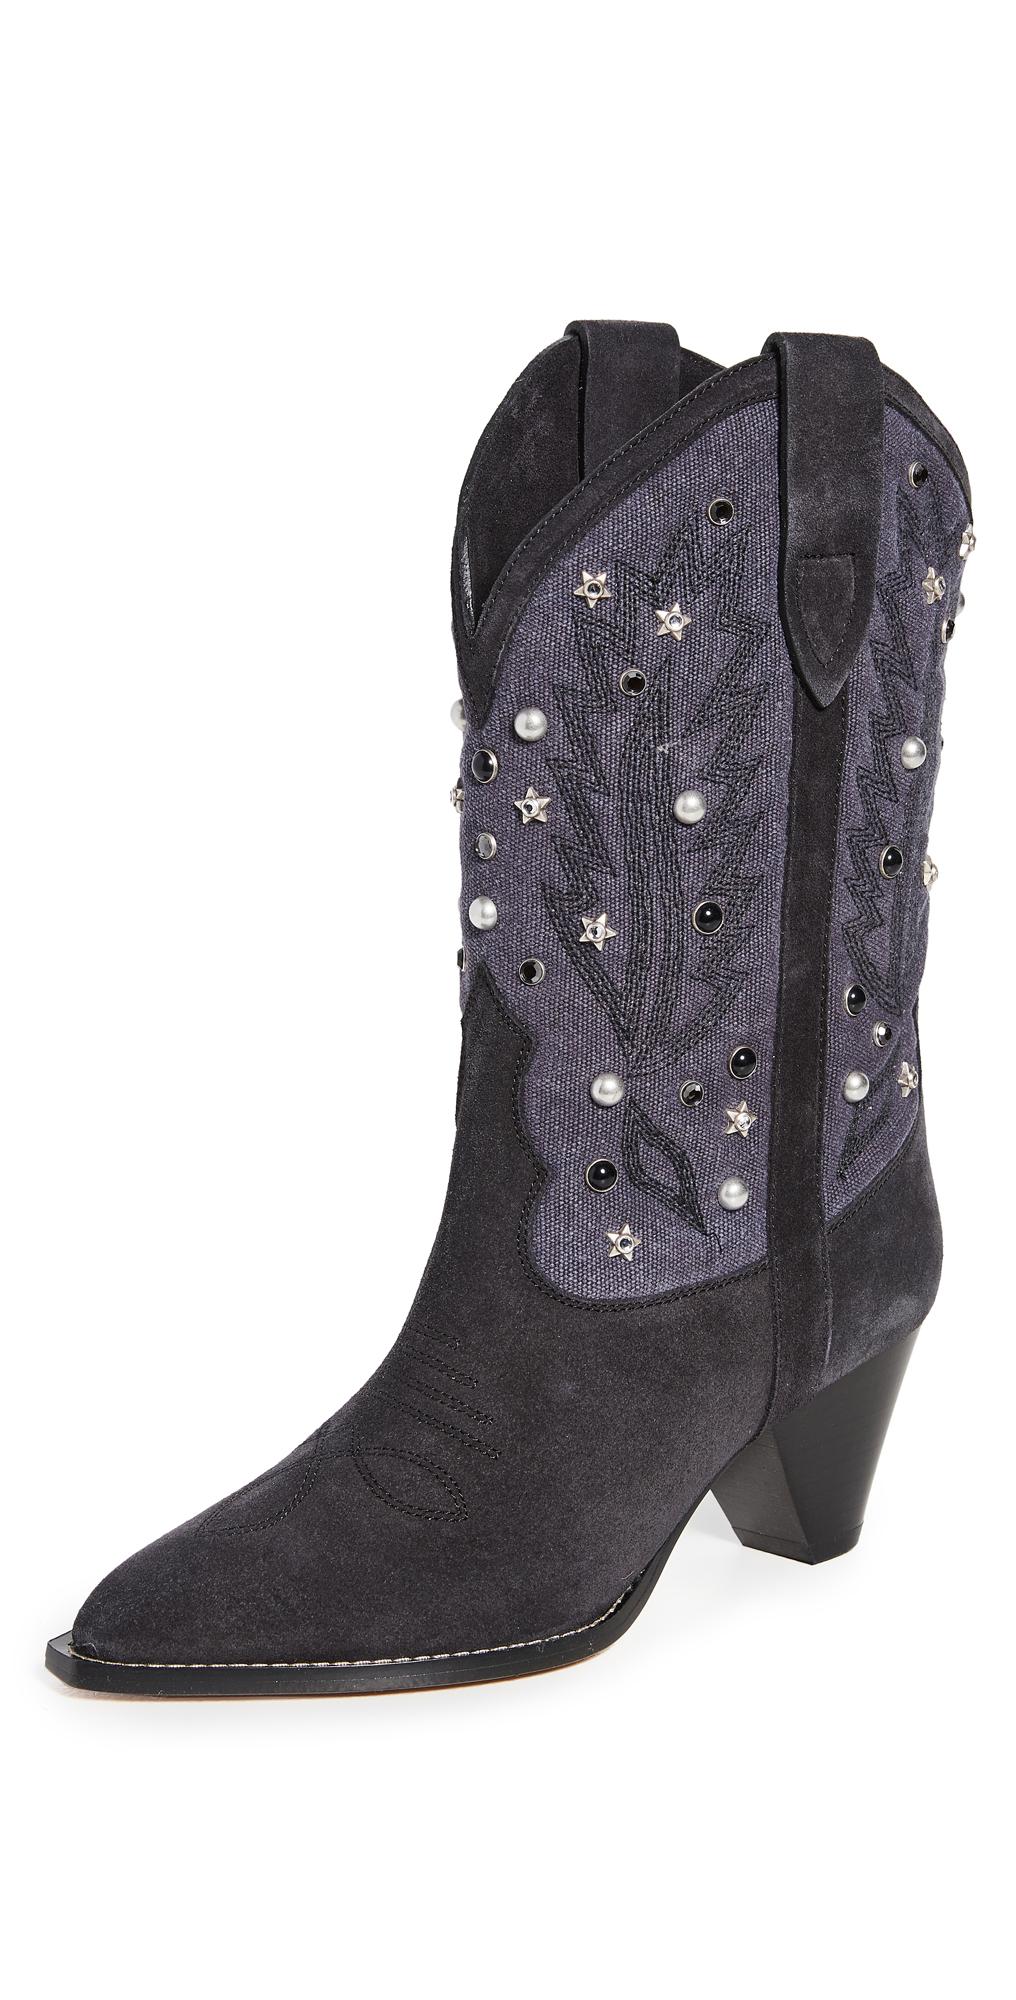 Isabel Marant Luliette Boots